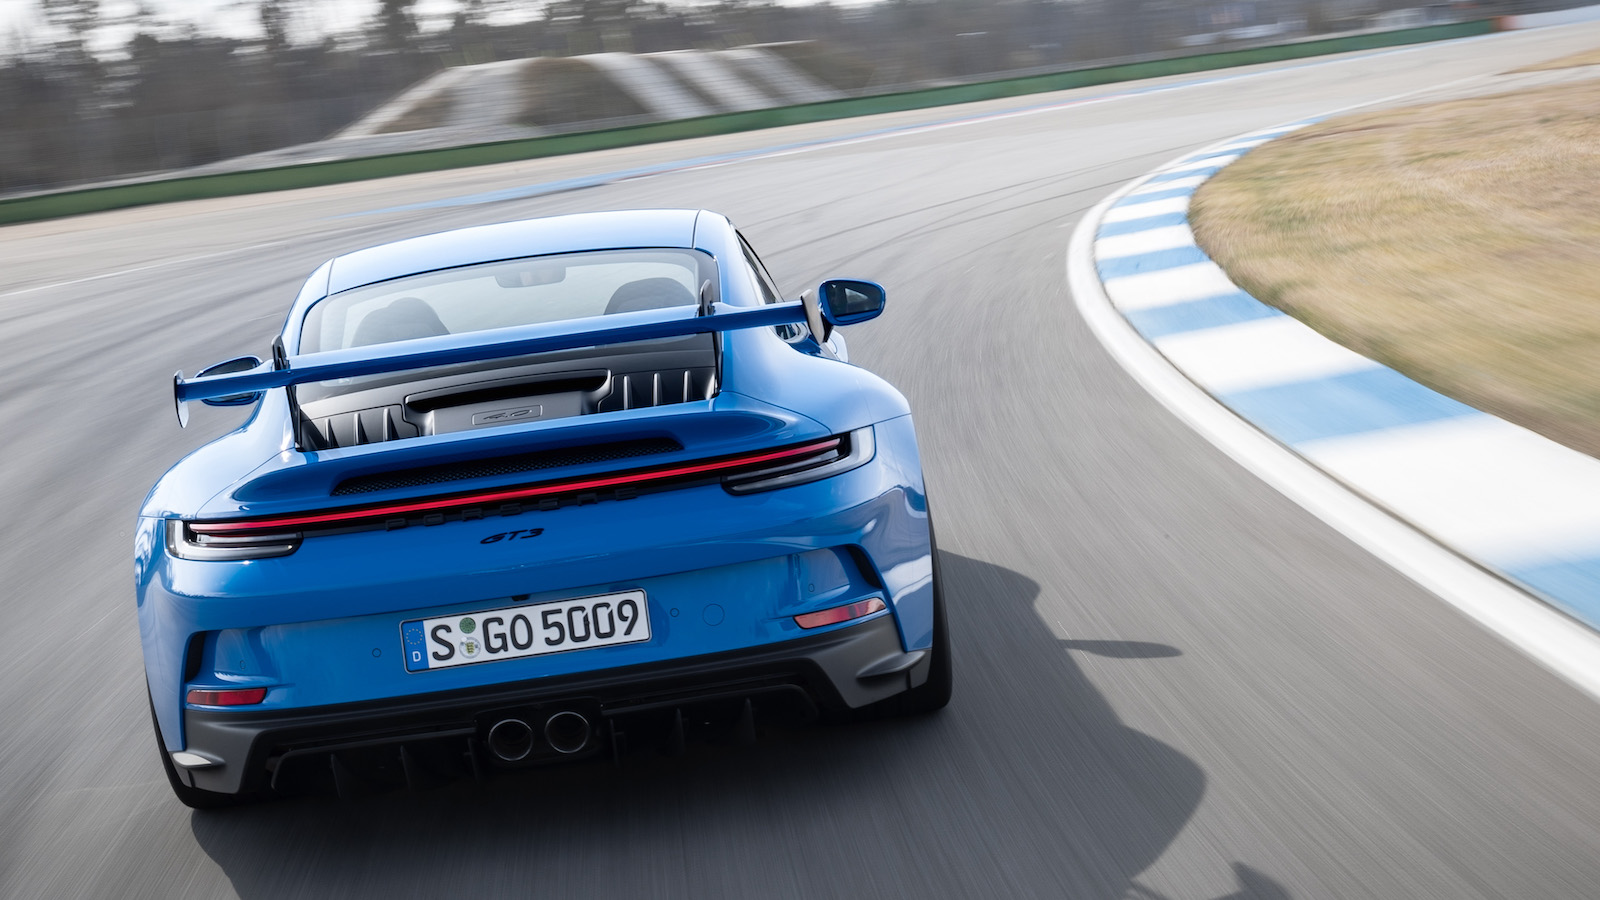 Porsche 911 GT3:源於賽道的極致調校